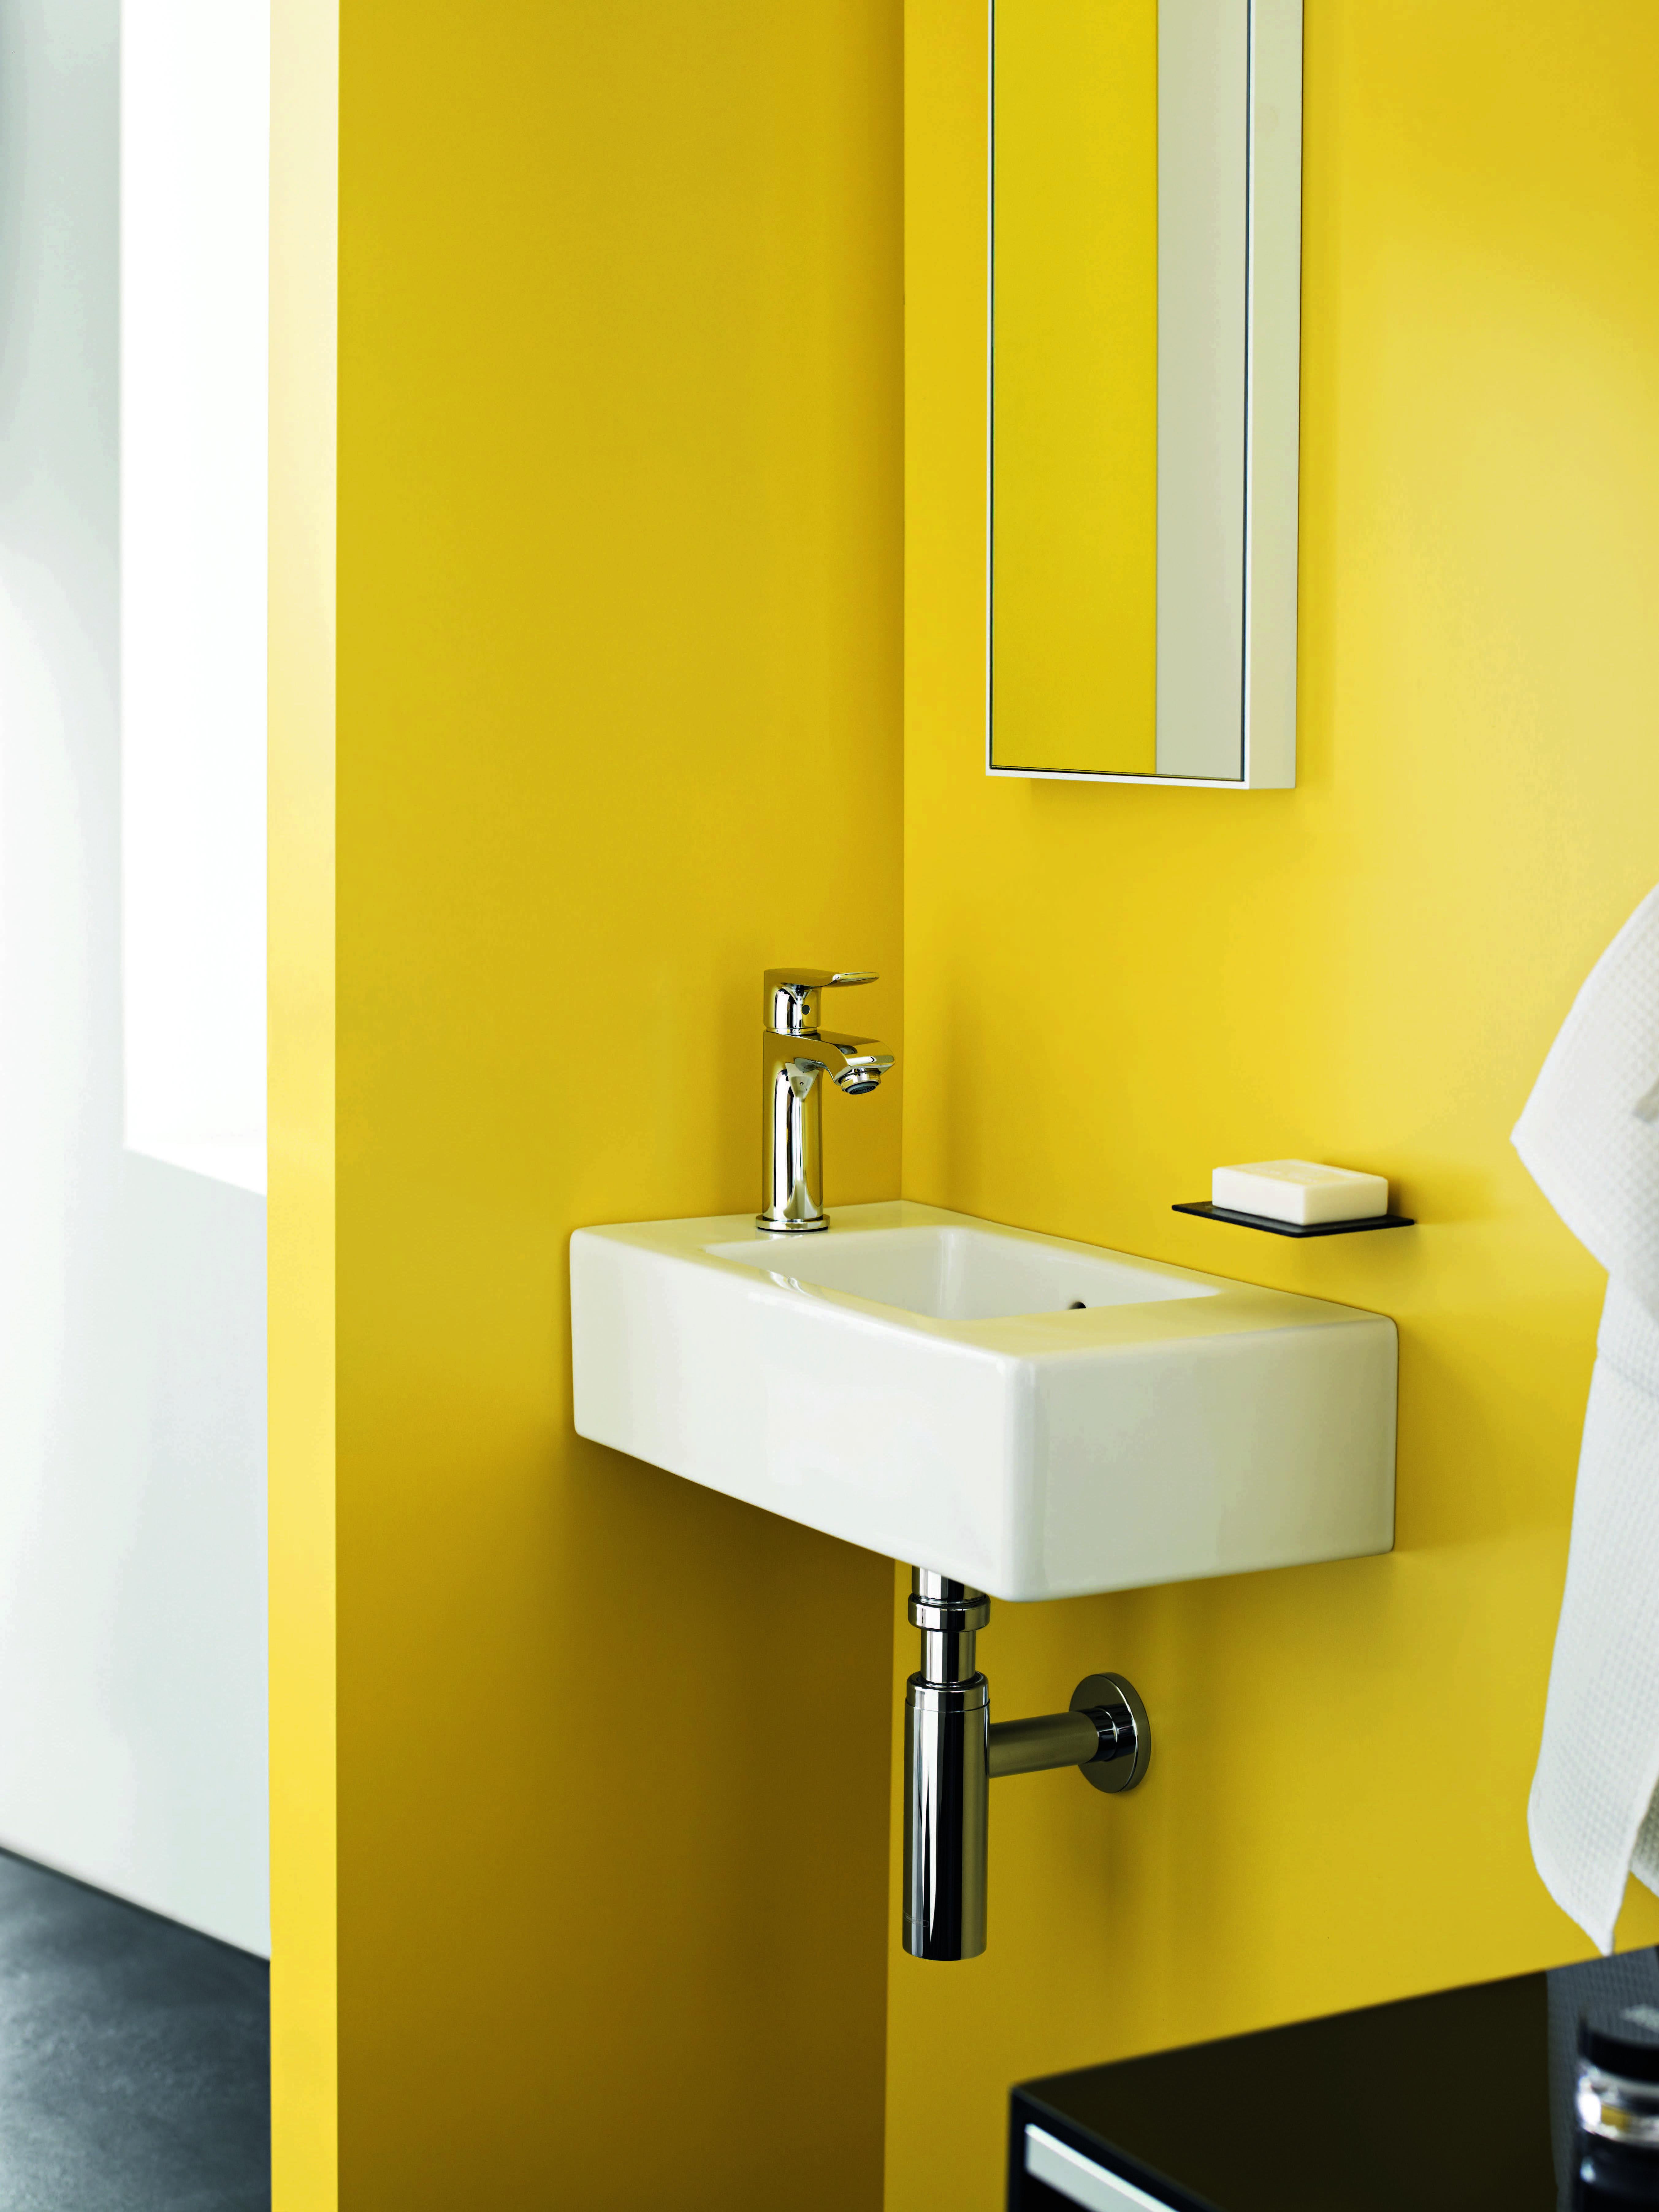 Metris Single Hole Faucet Bathroom Bathroom Taps